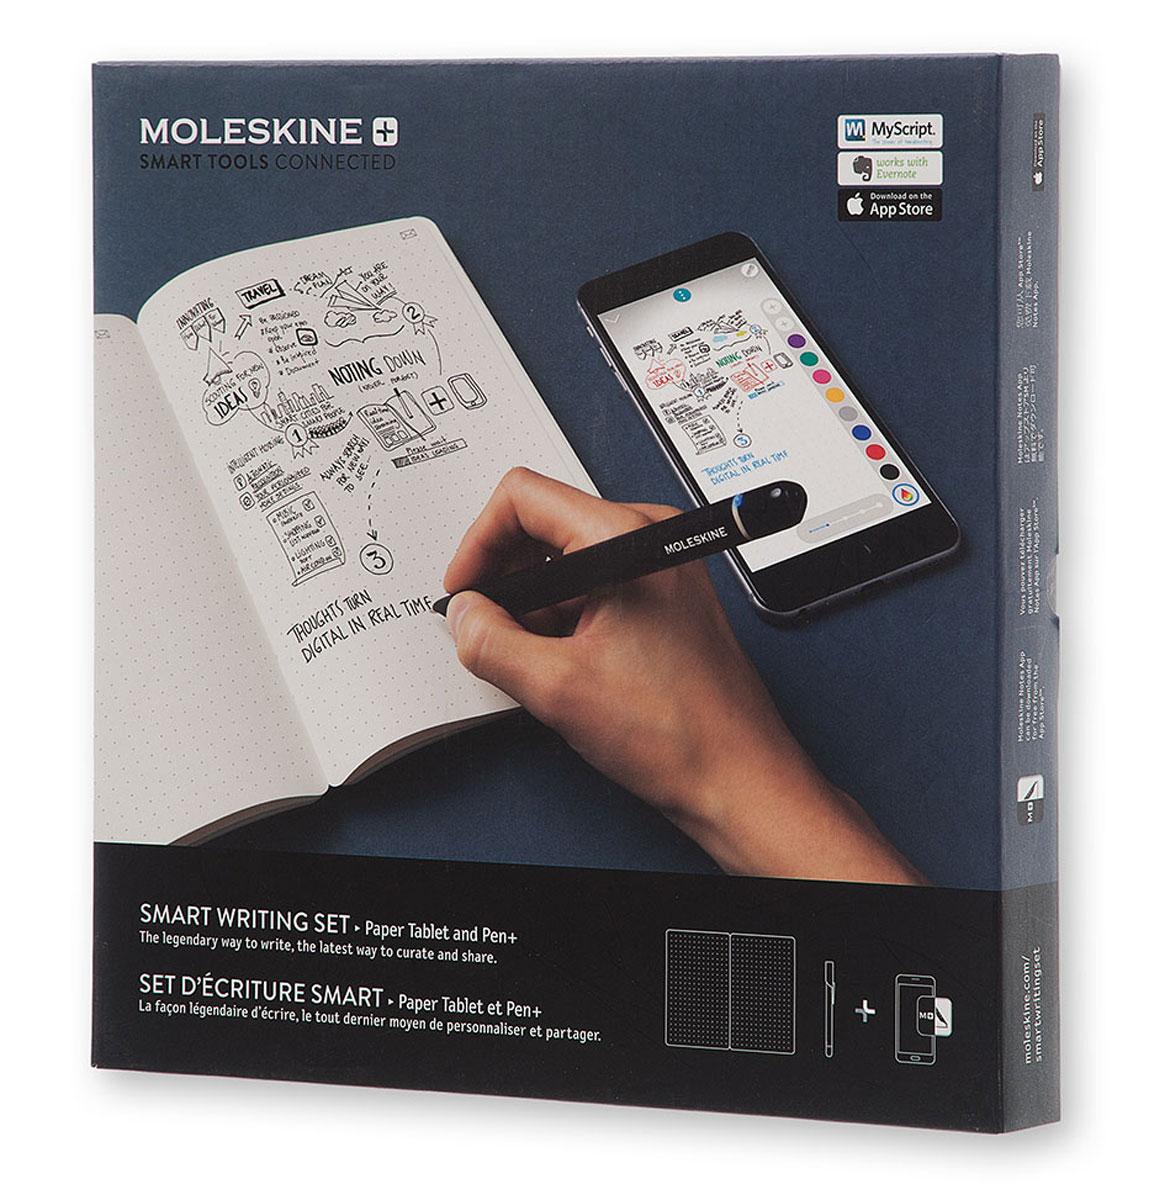 Moleskine Набор Smart Writing блокнот Paper Tablet / ручка Smart Pen+